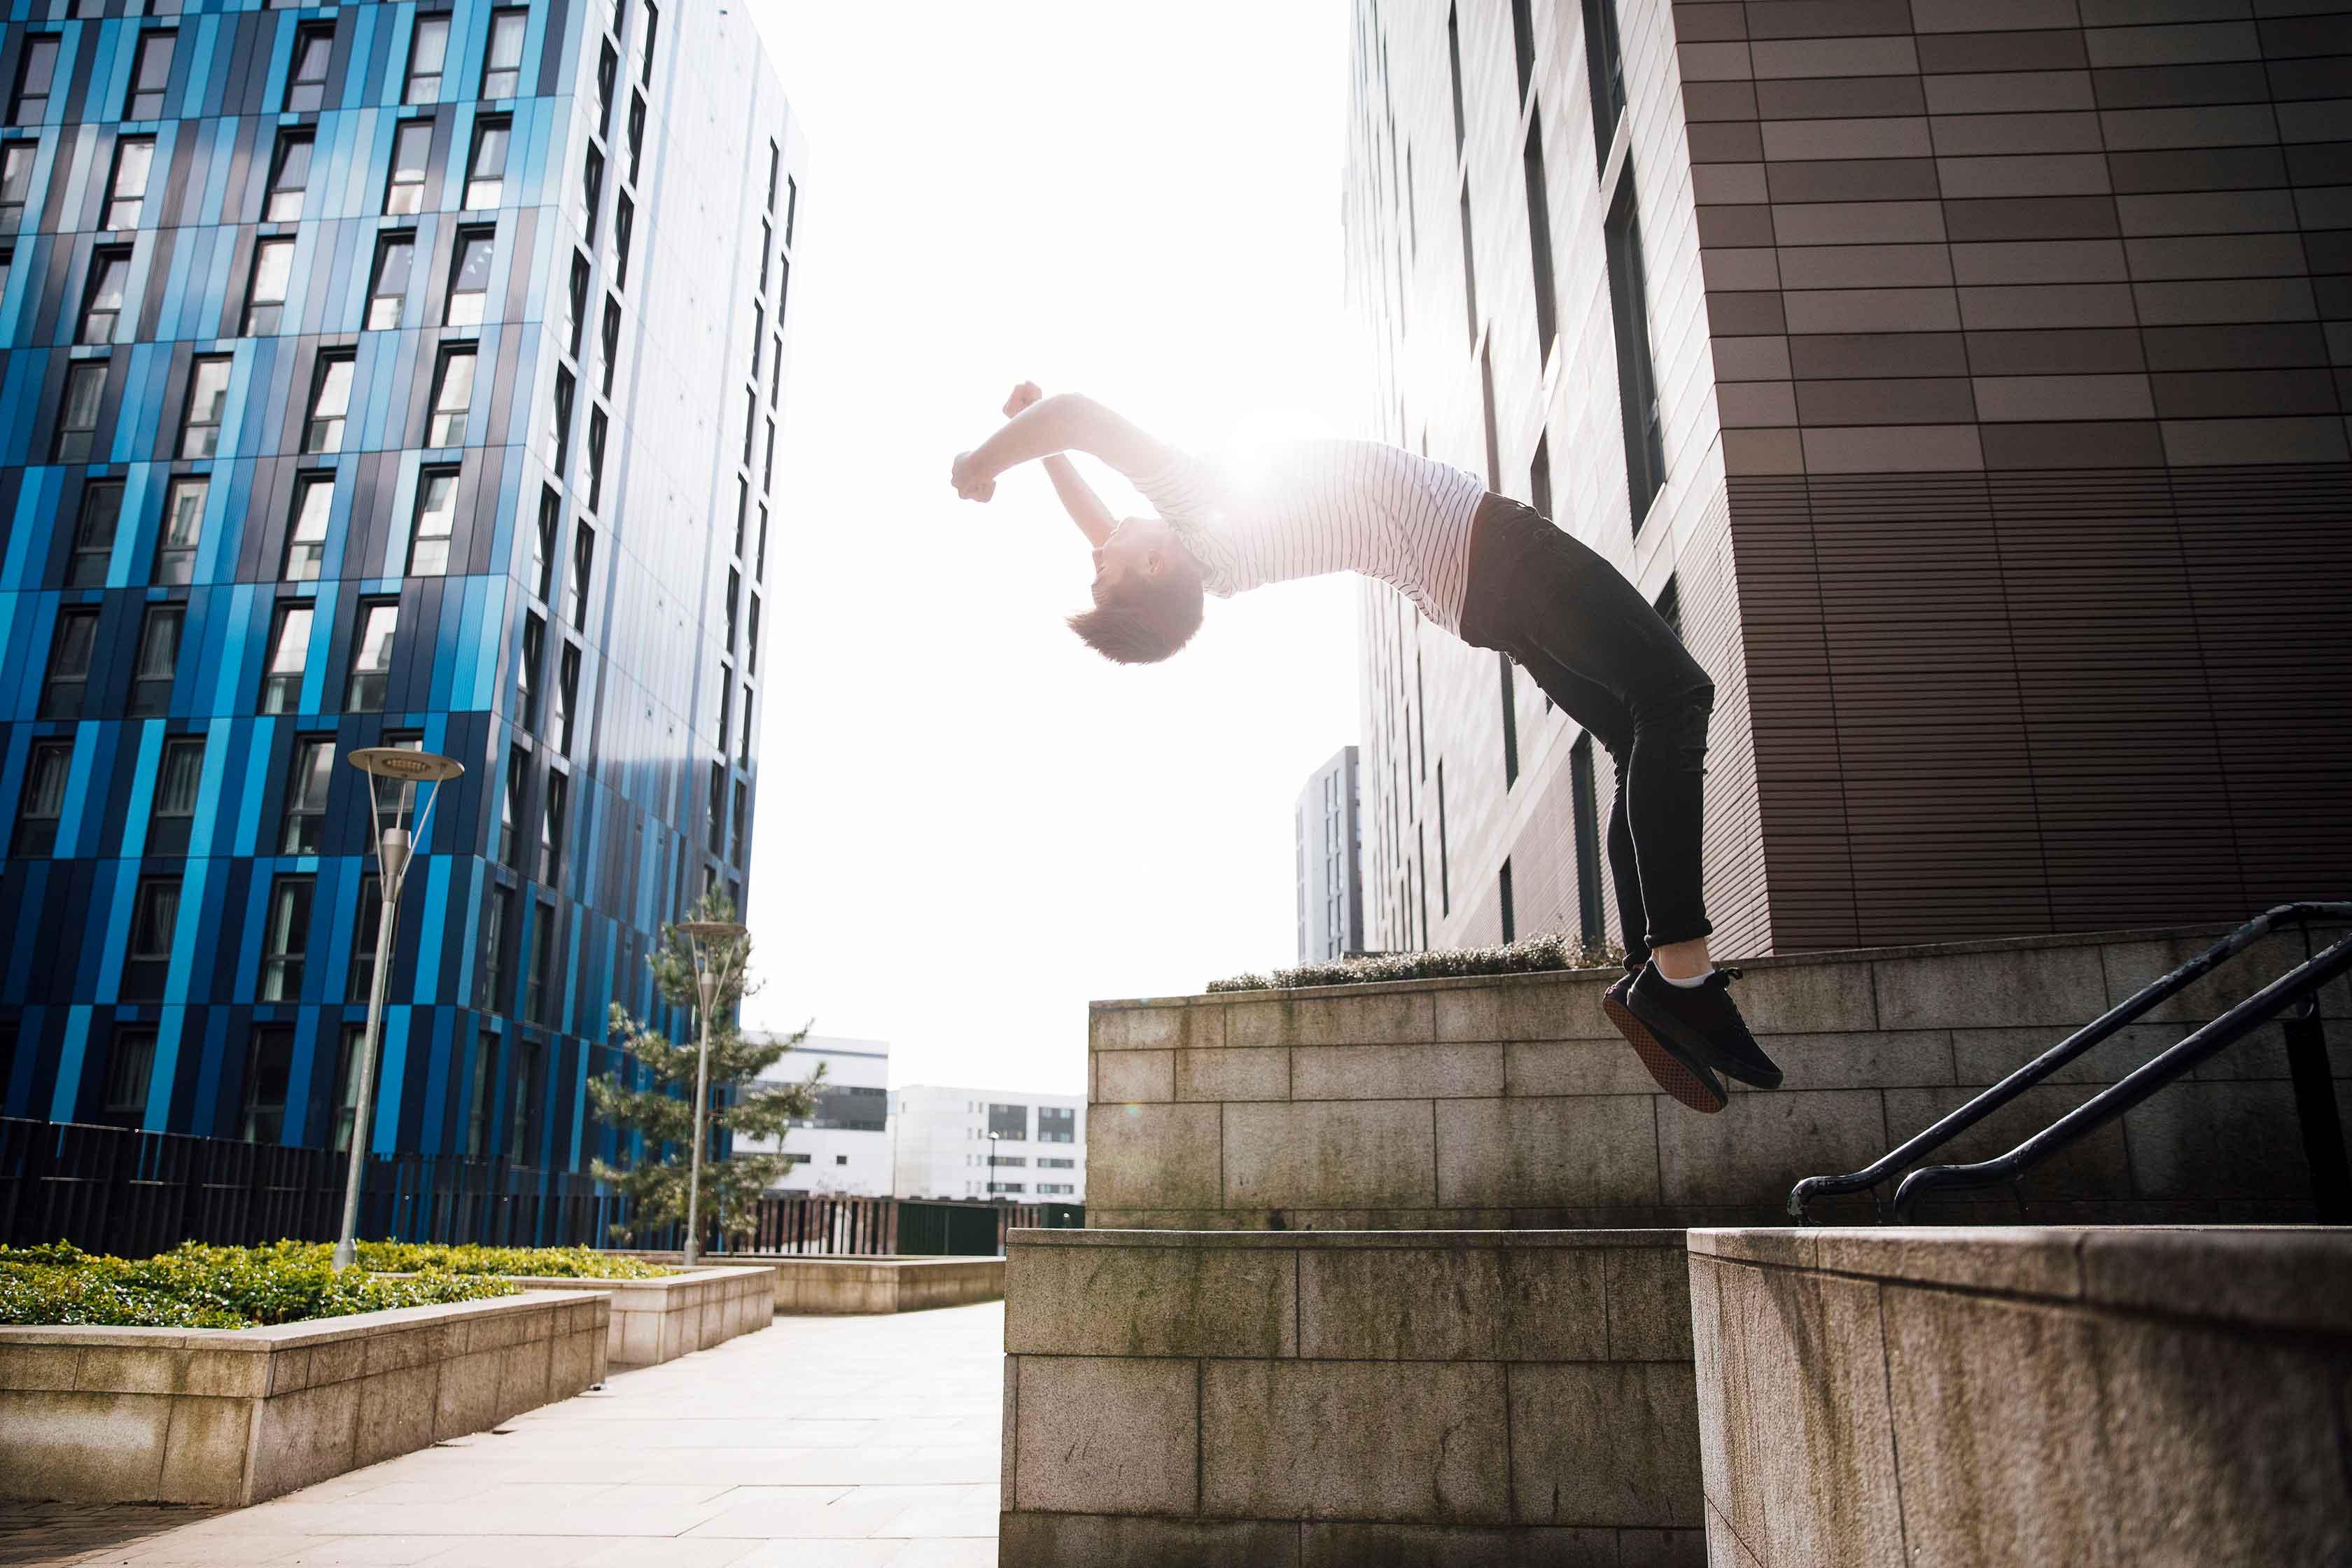 Hoppende person foran bygninger